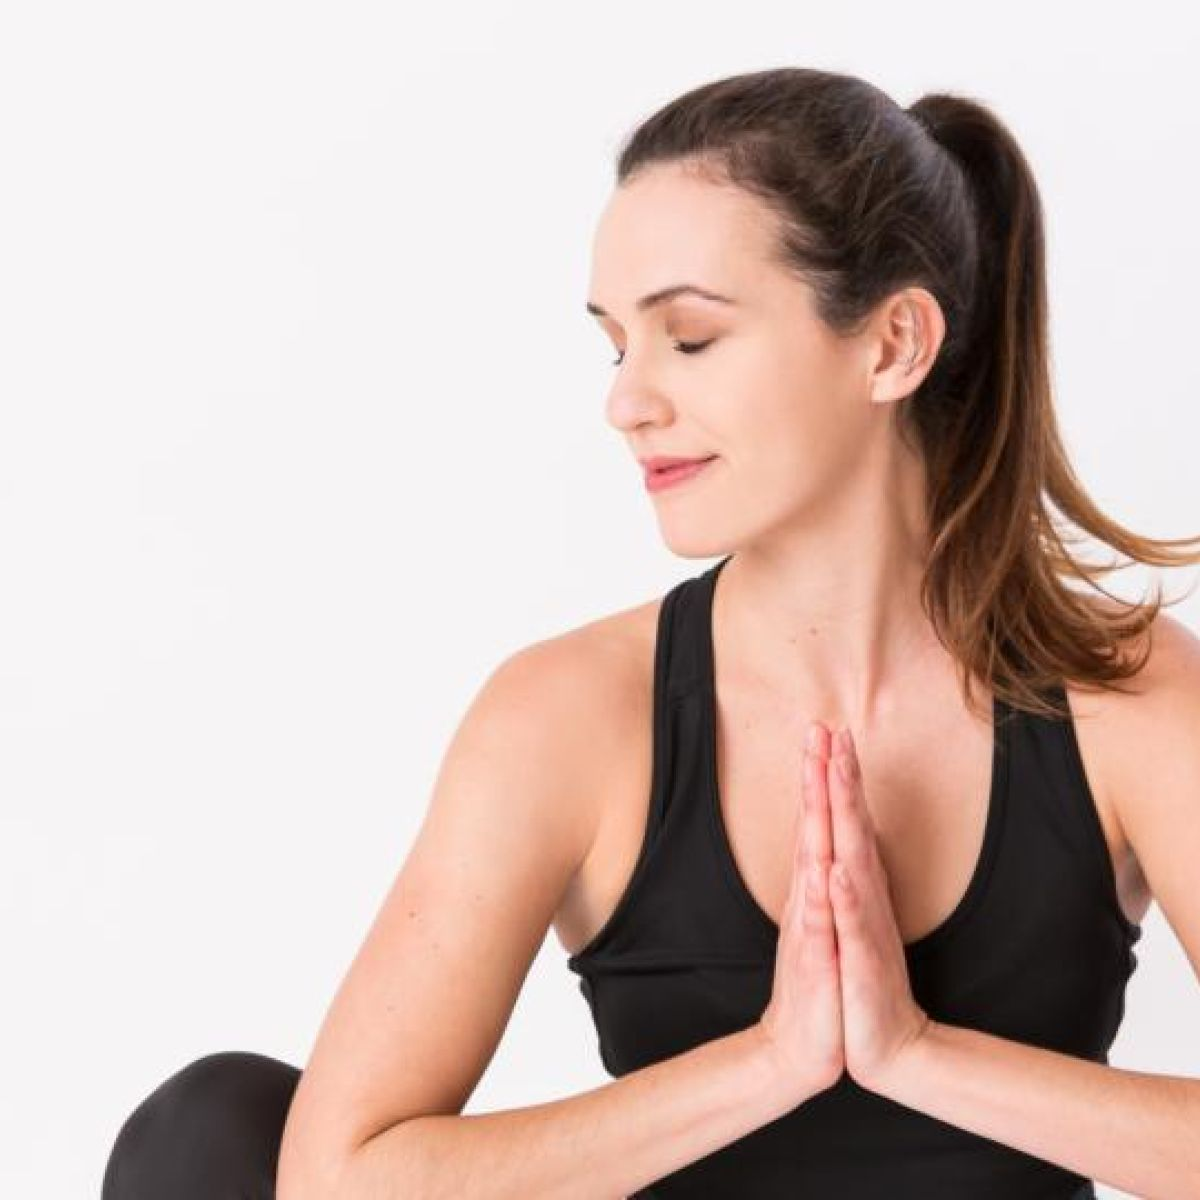 Yoga With Adriene Mishler She Changed My Life